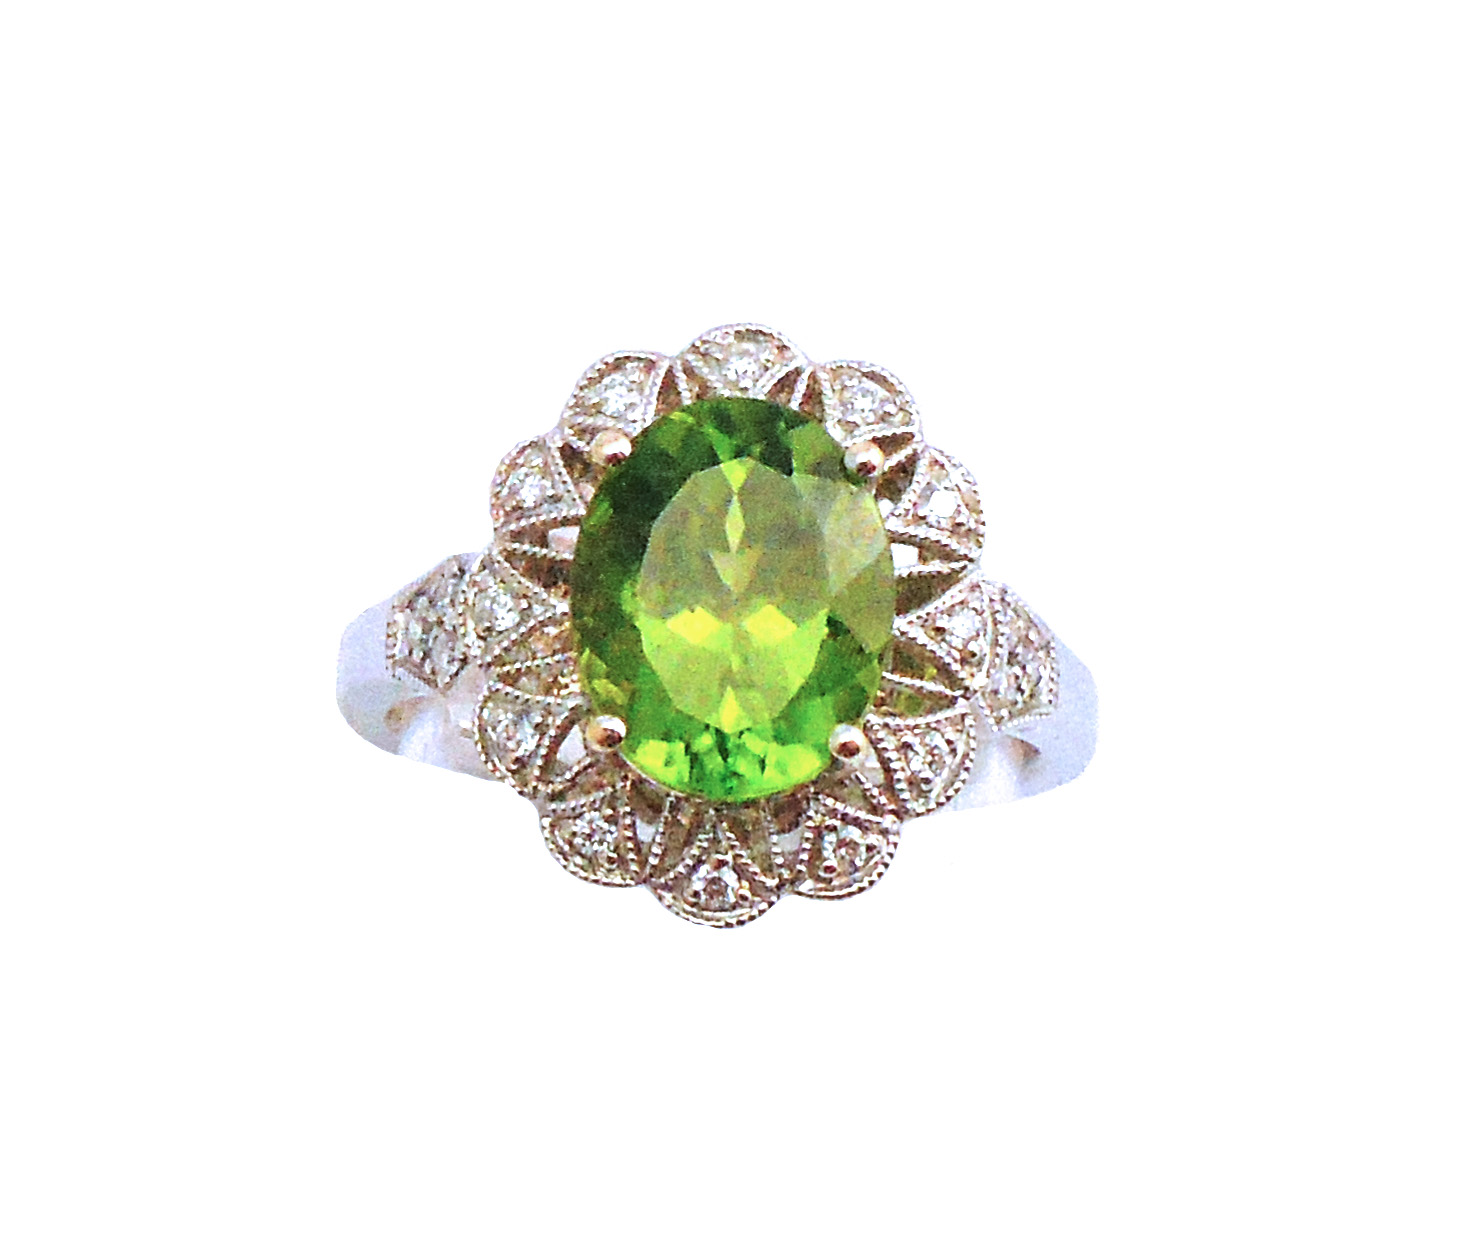 18K White Gold Peridot and Diamond Ring